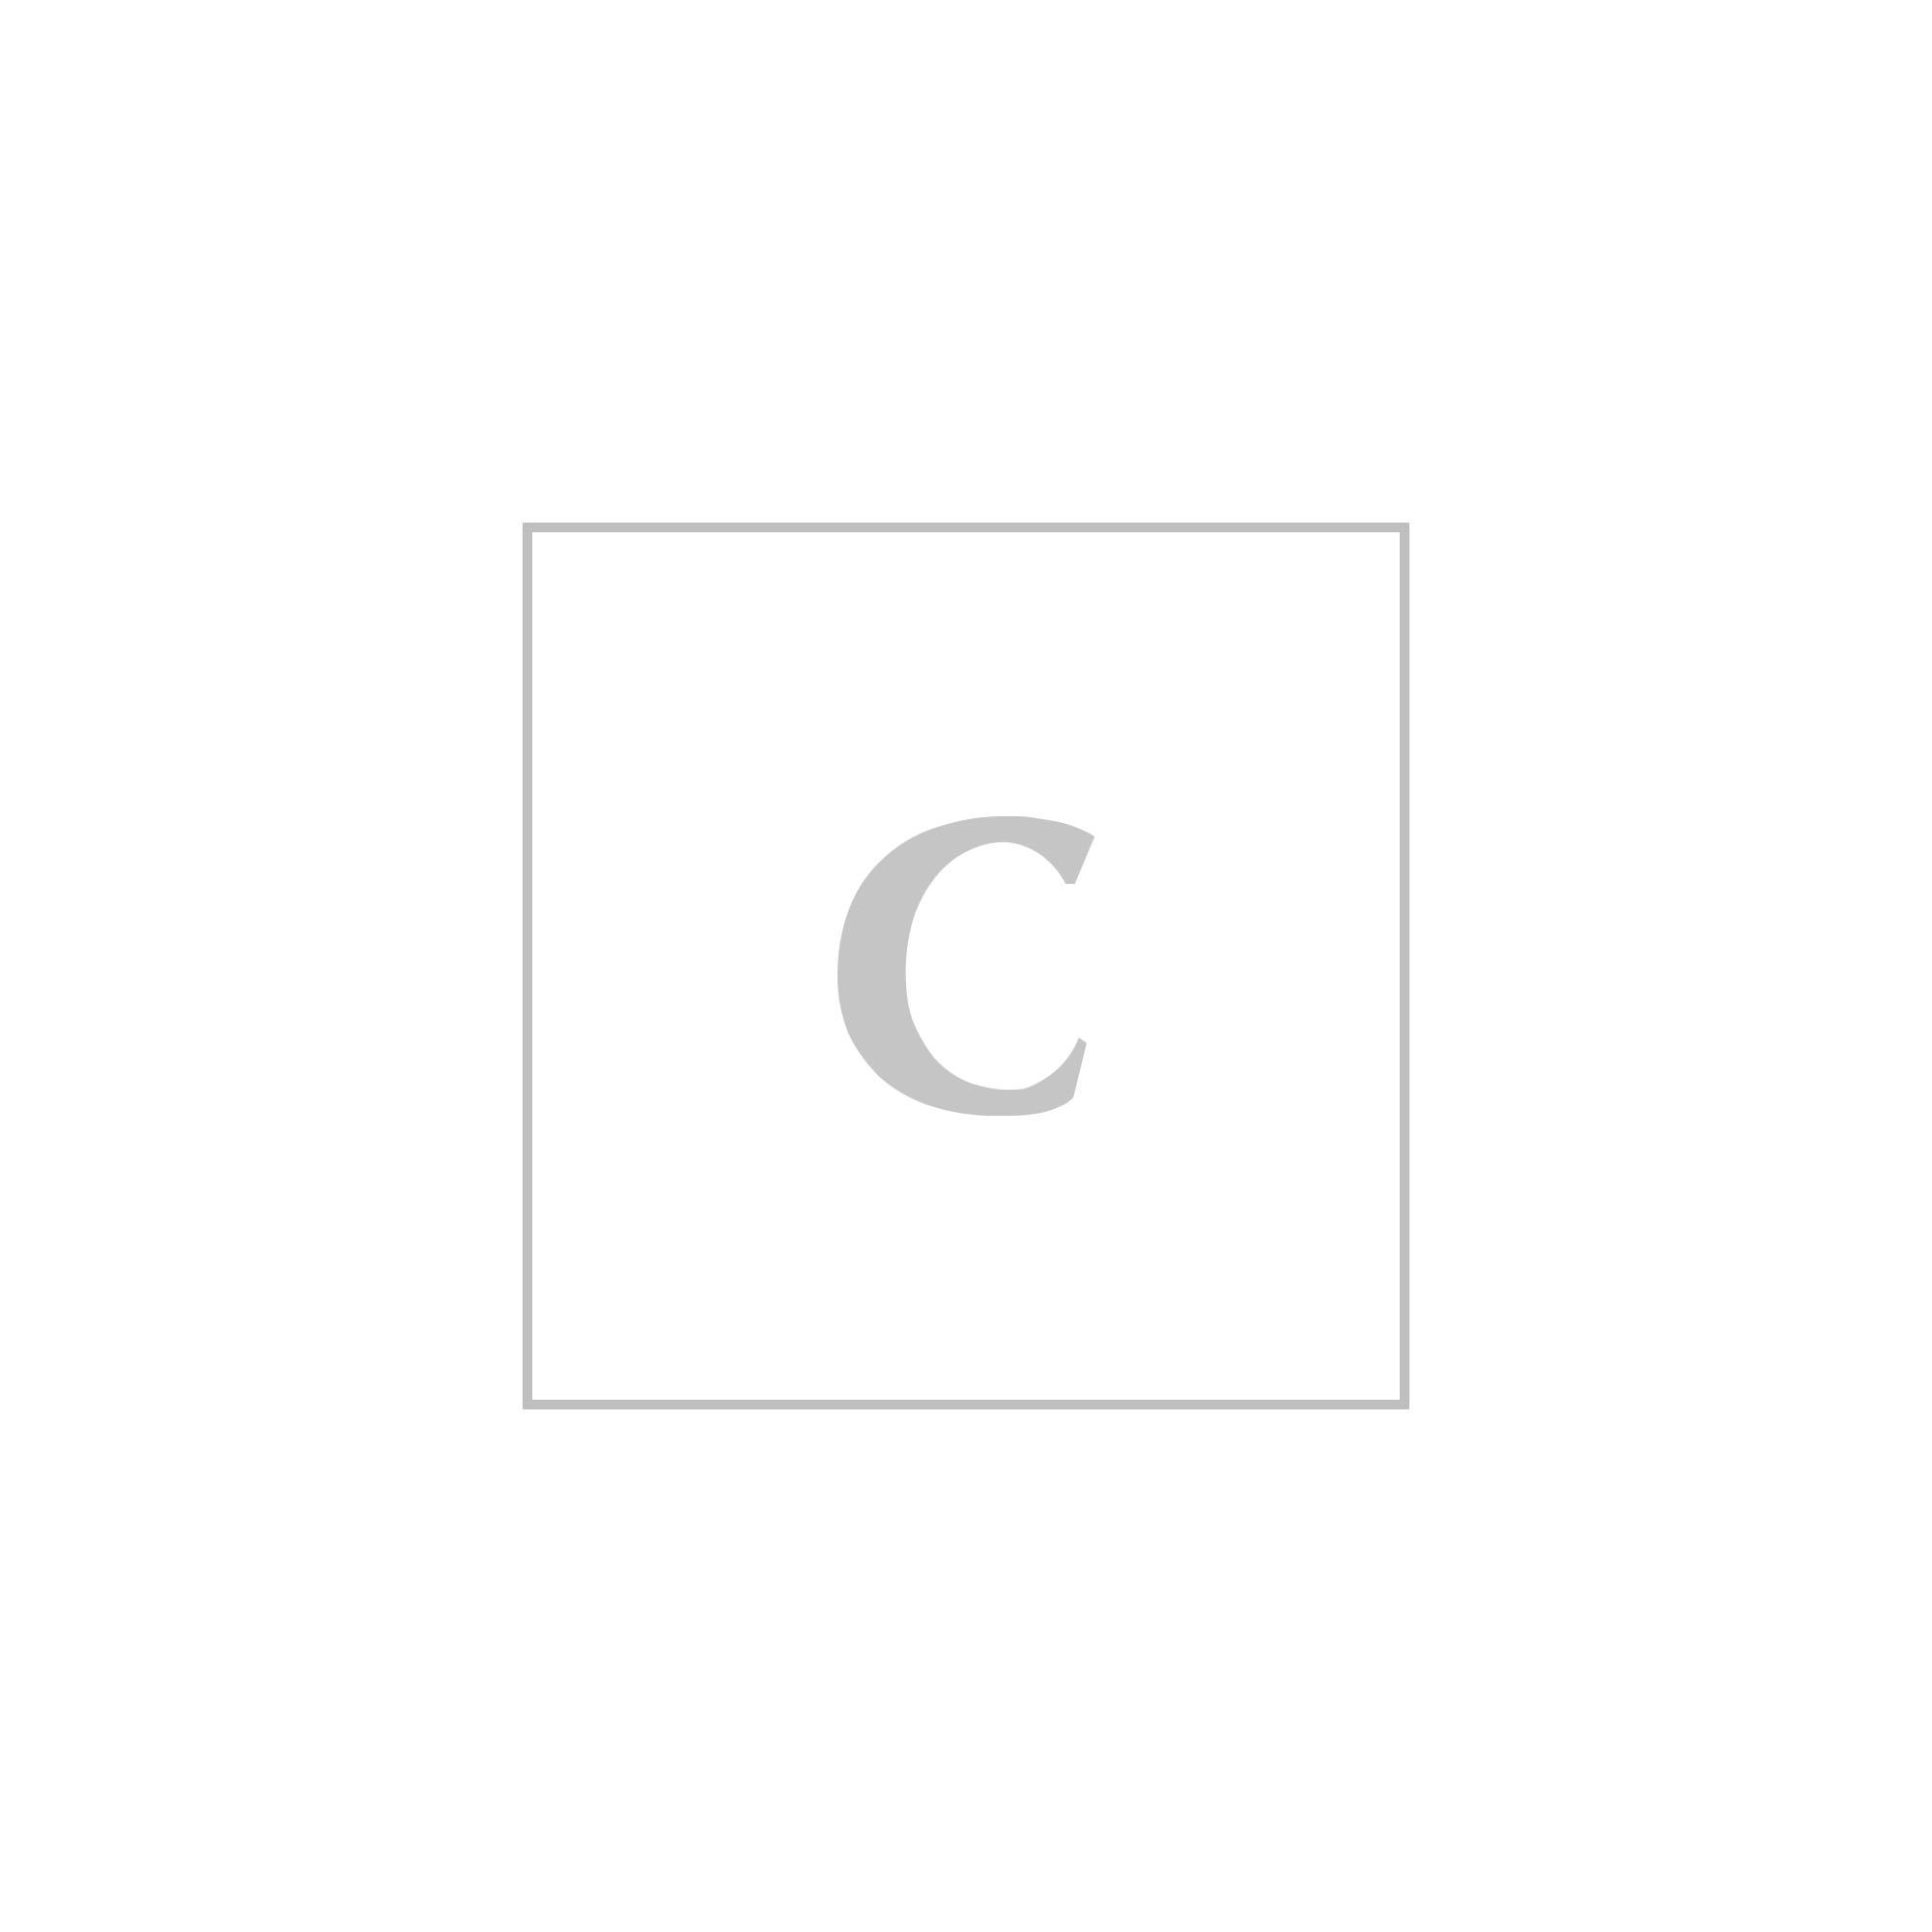 Versace zaino nappa stampa camoupard palazzo